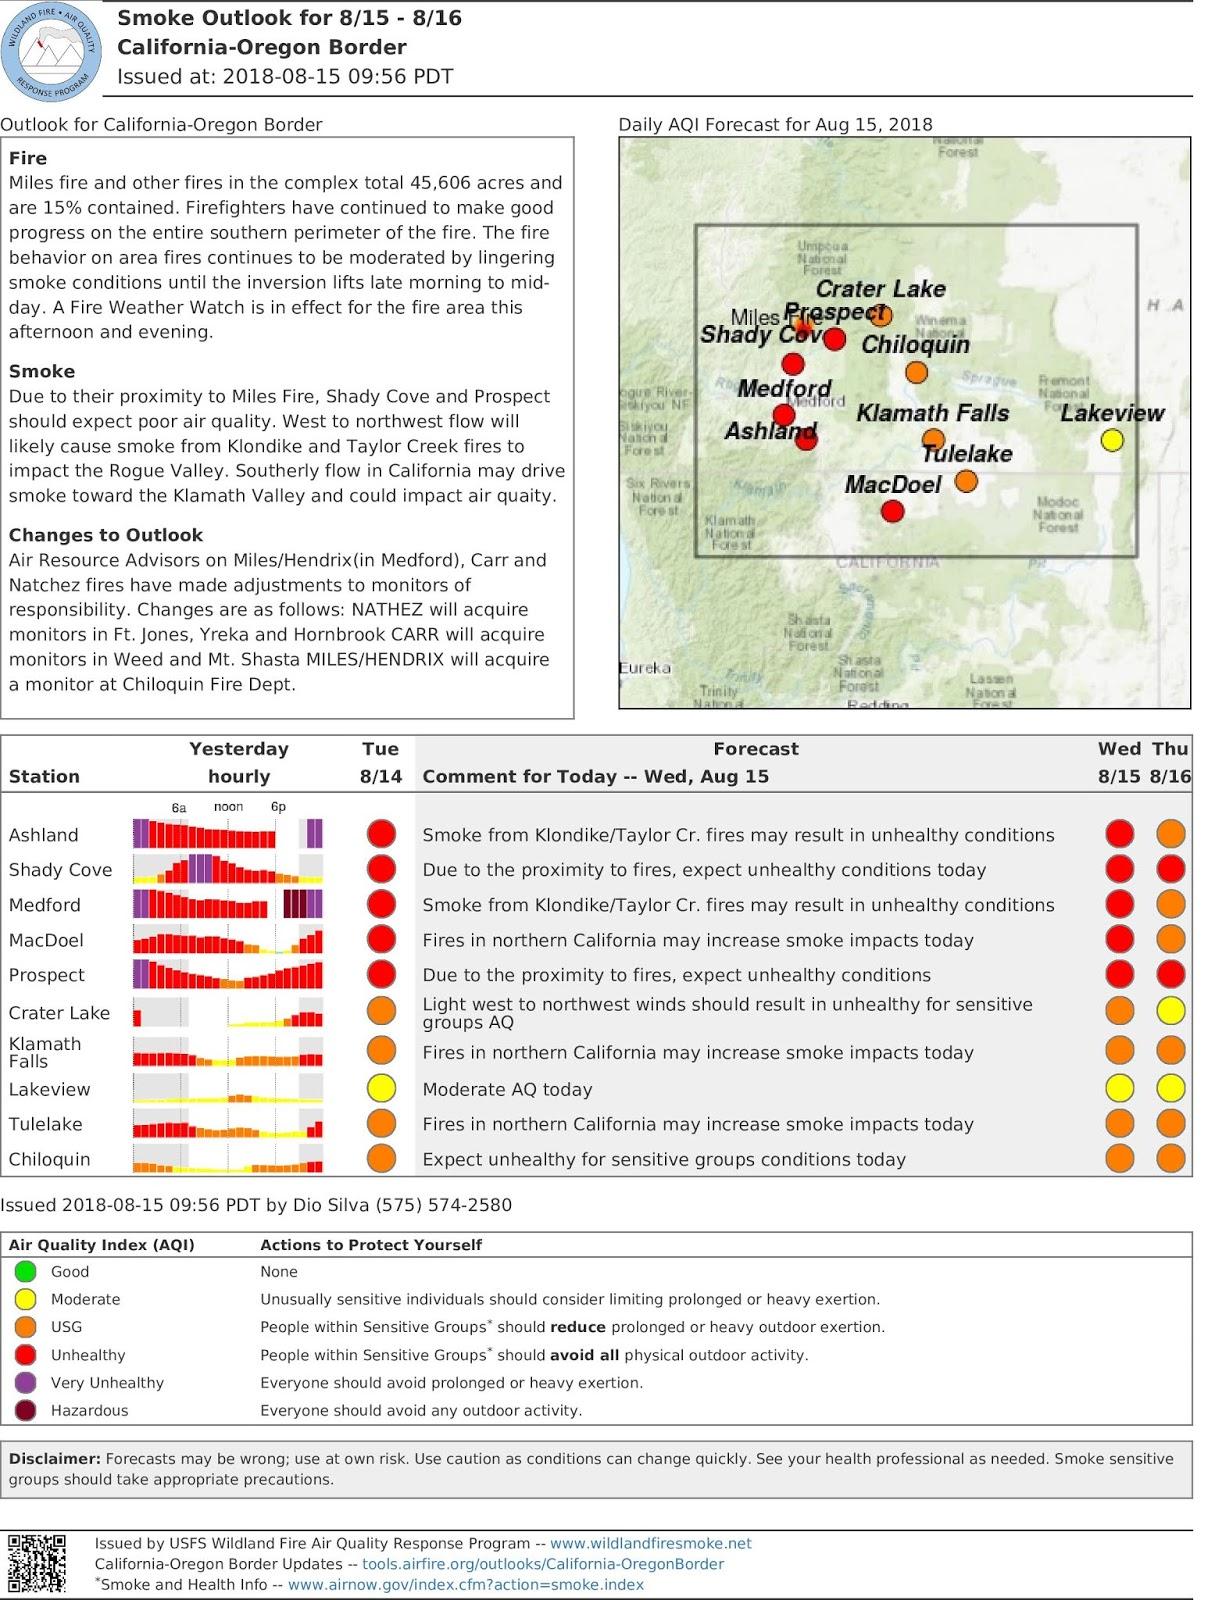 wed aug 15 california oregon border smoke outlook